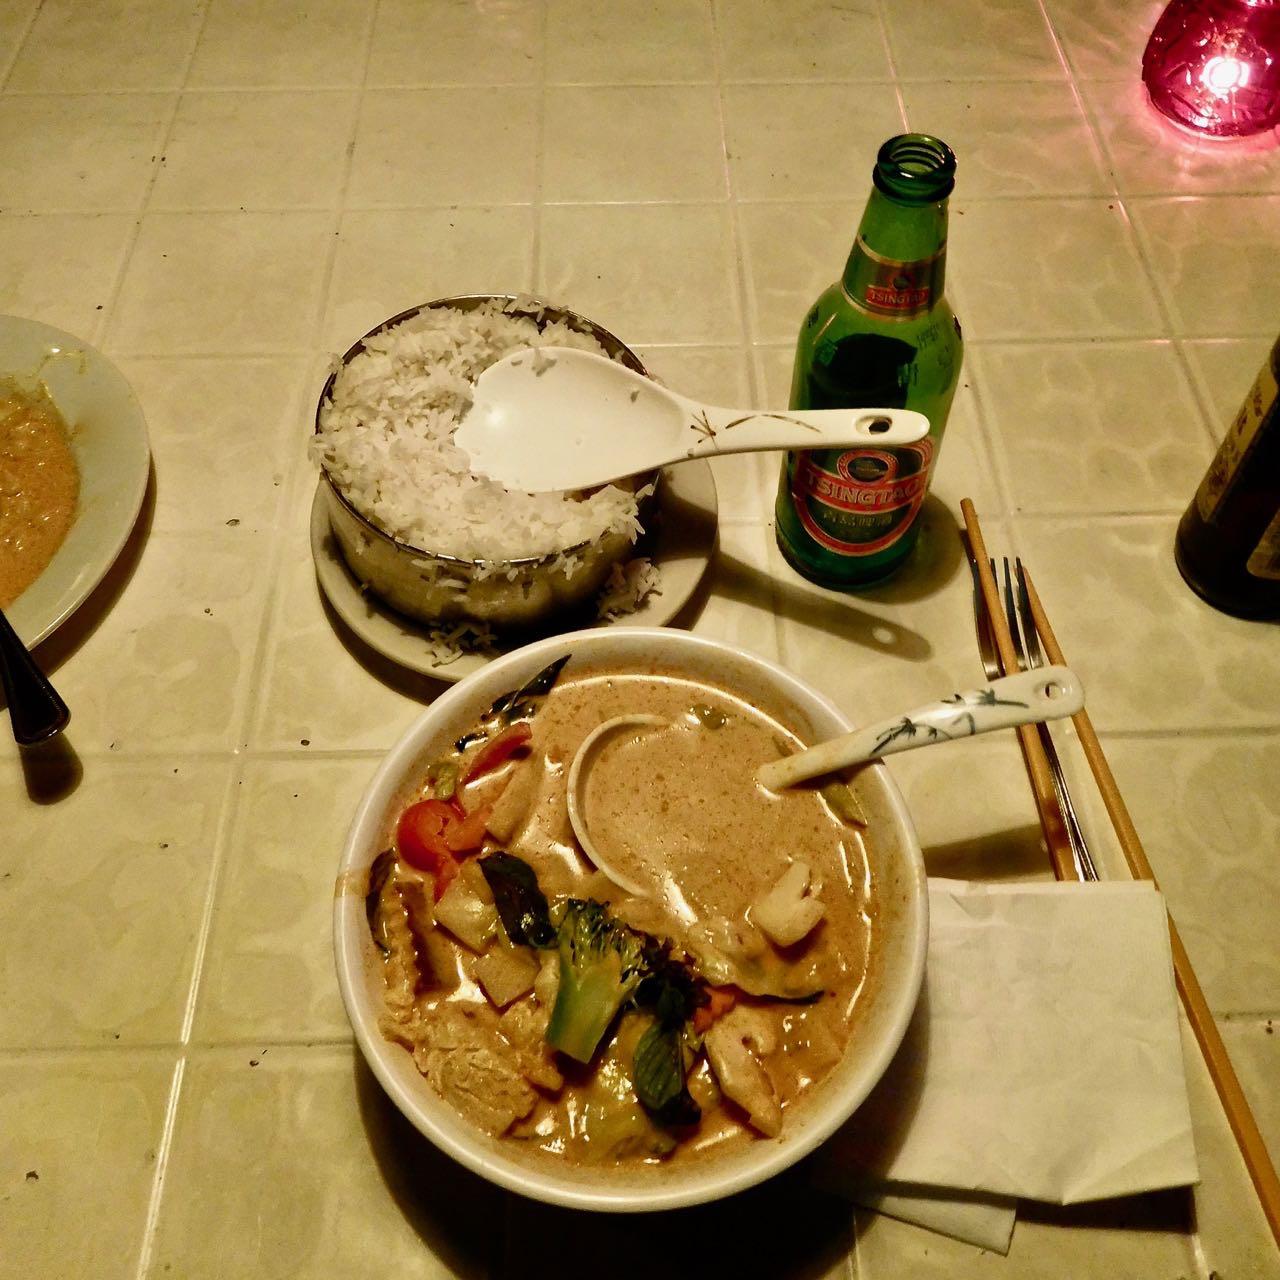 3 Days in L.A. - Toi Thai Food Restaurant (6)